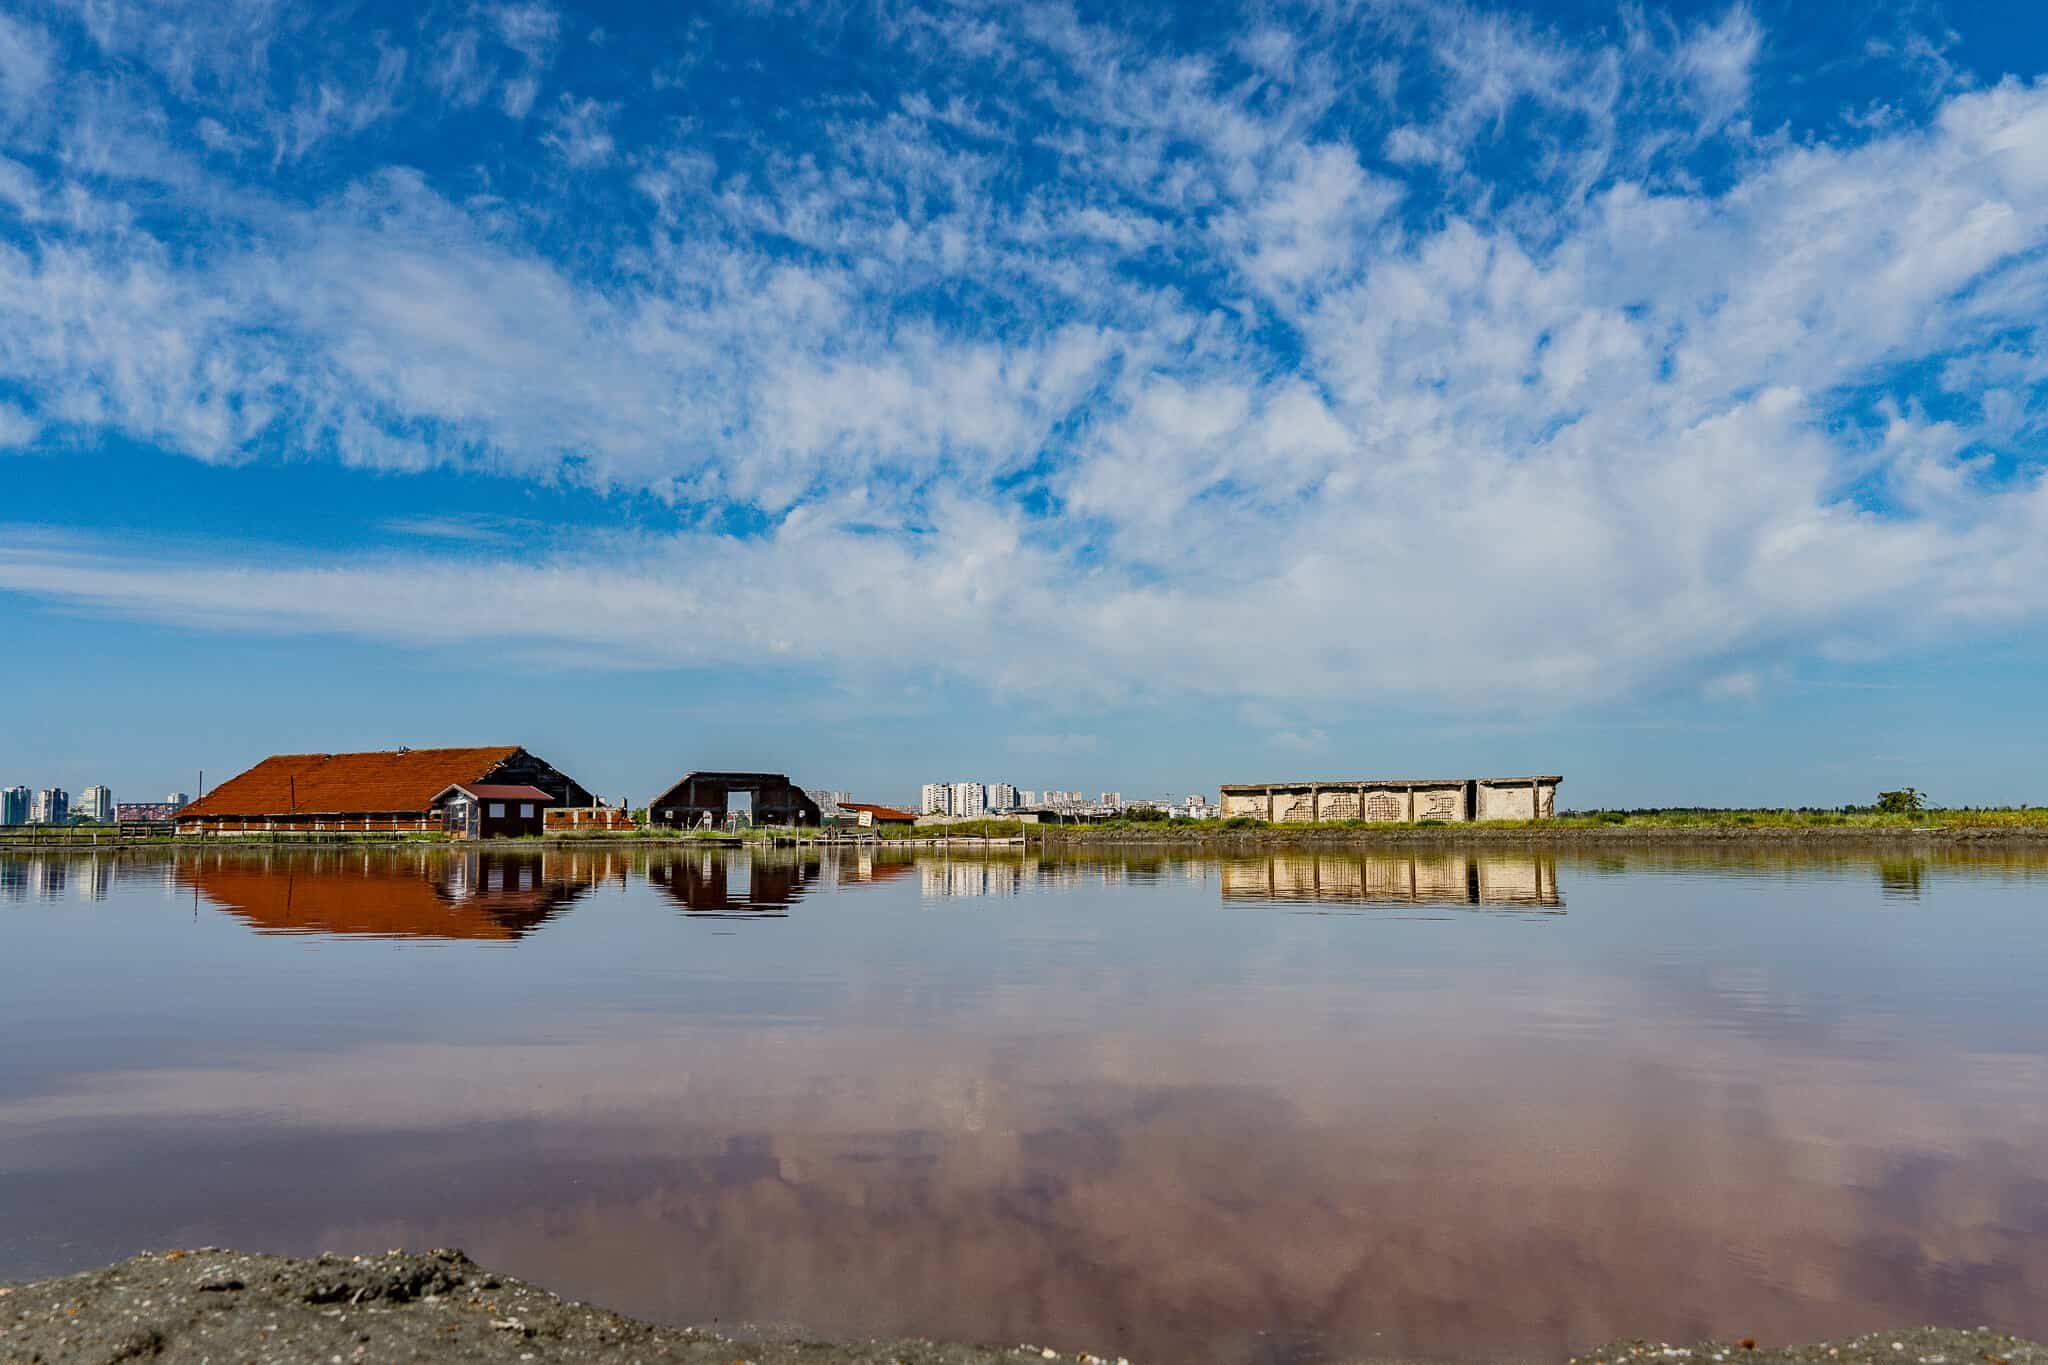 Spiegelung Atanasovsco Lake